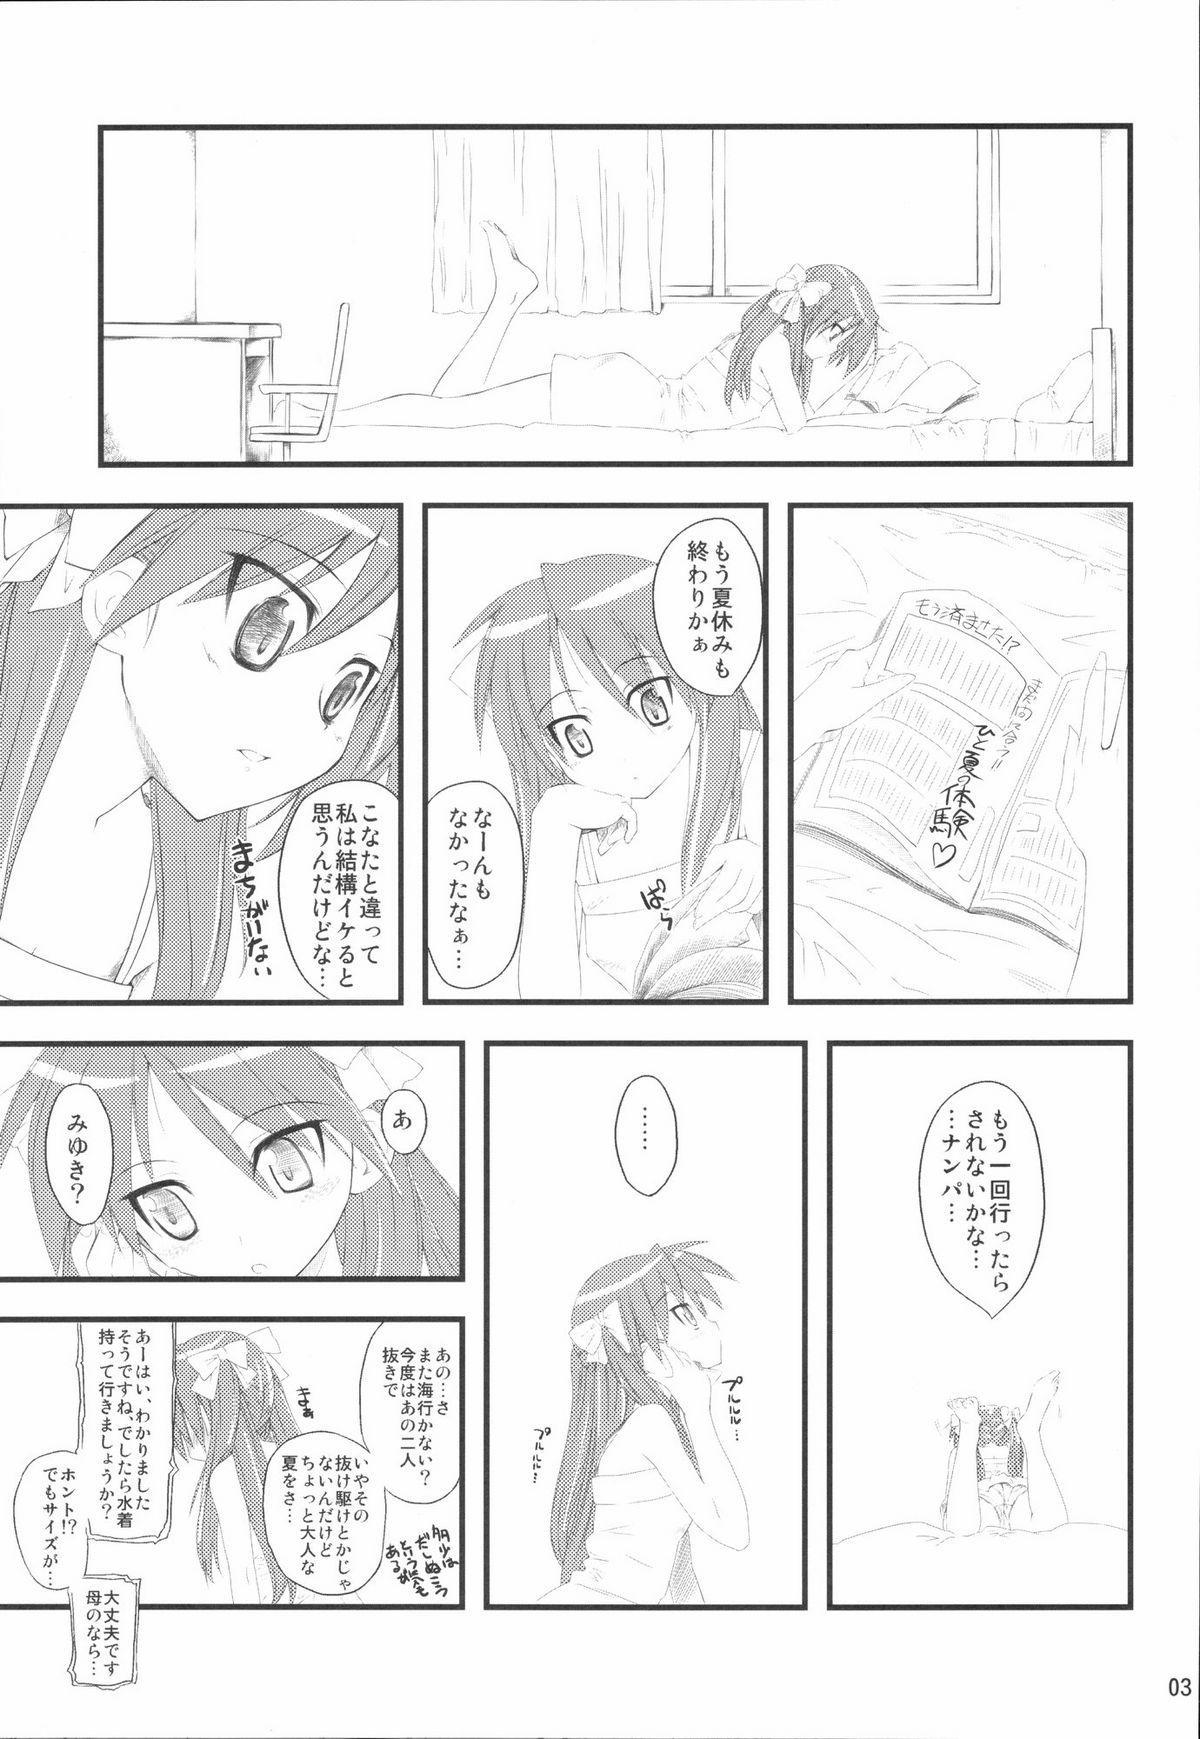 Natsu in Summer 1